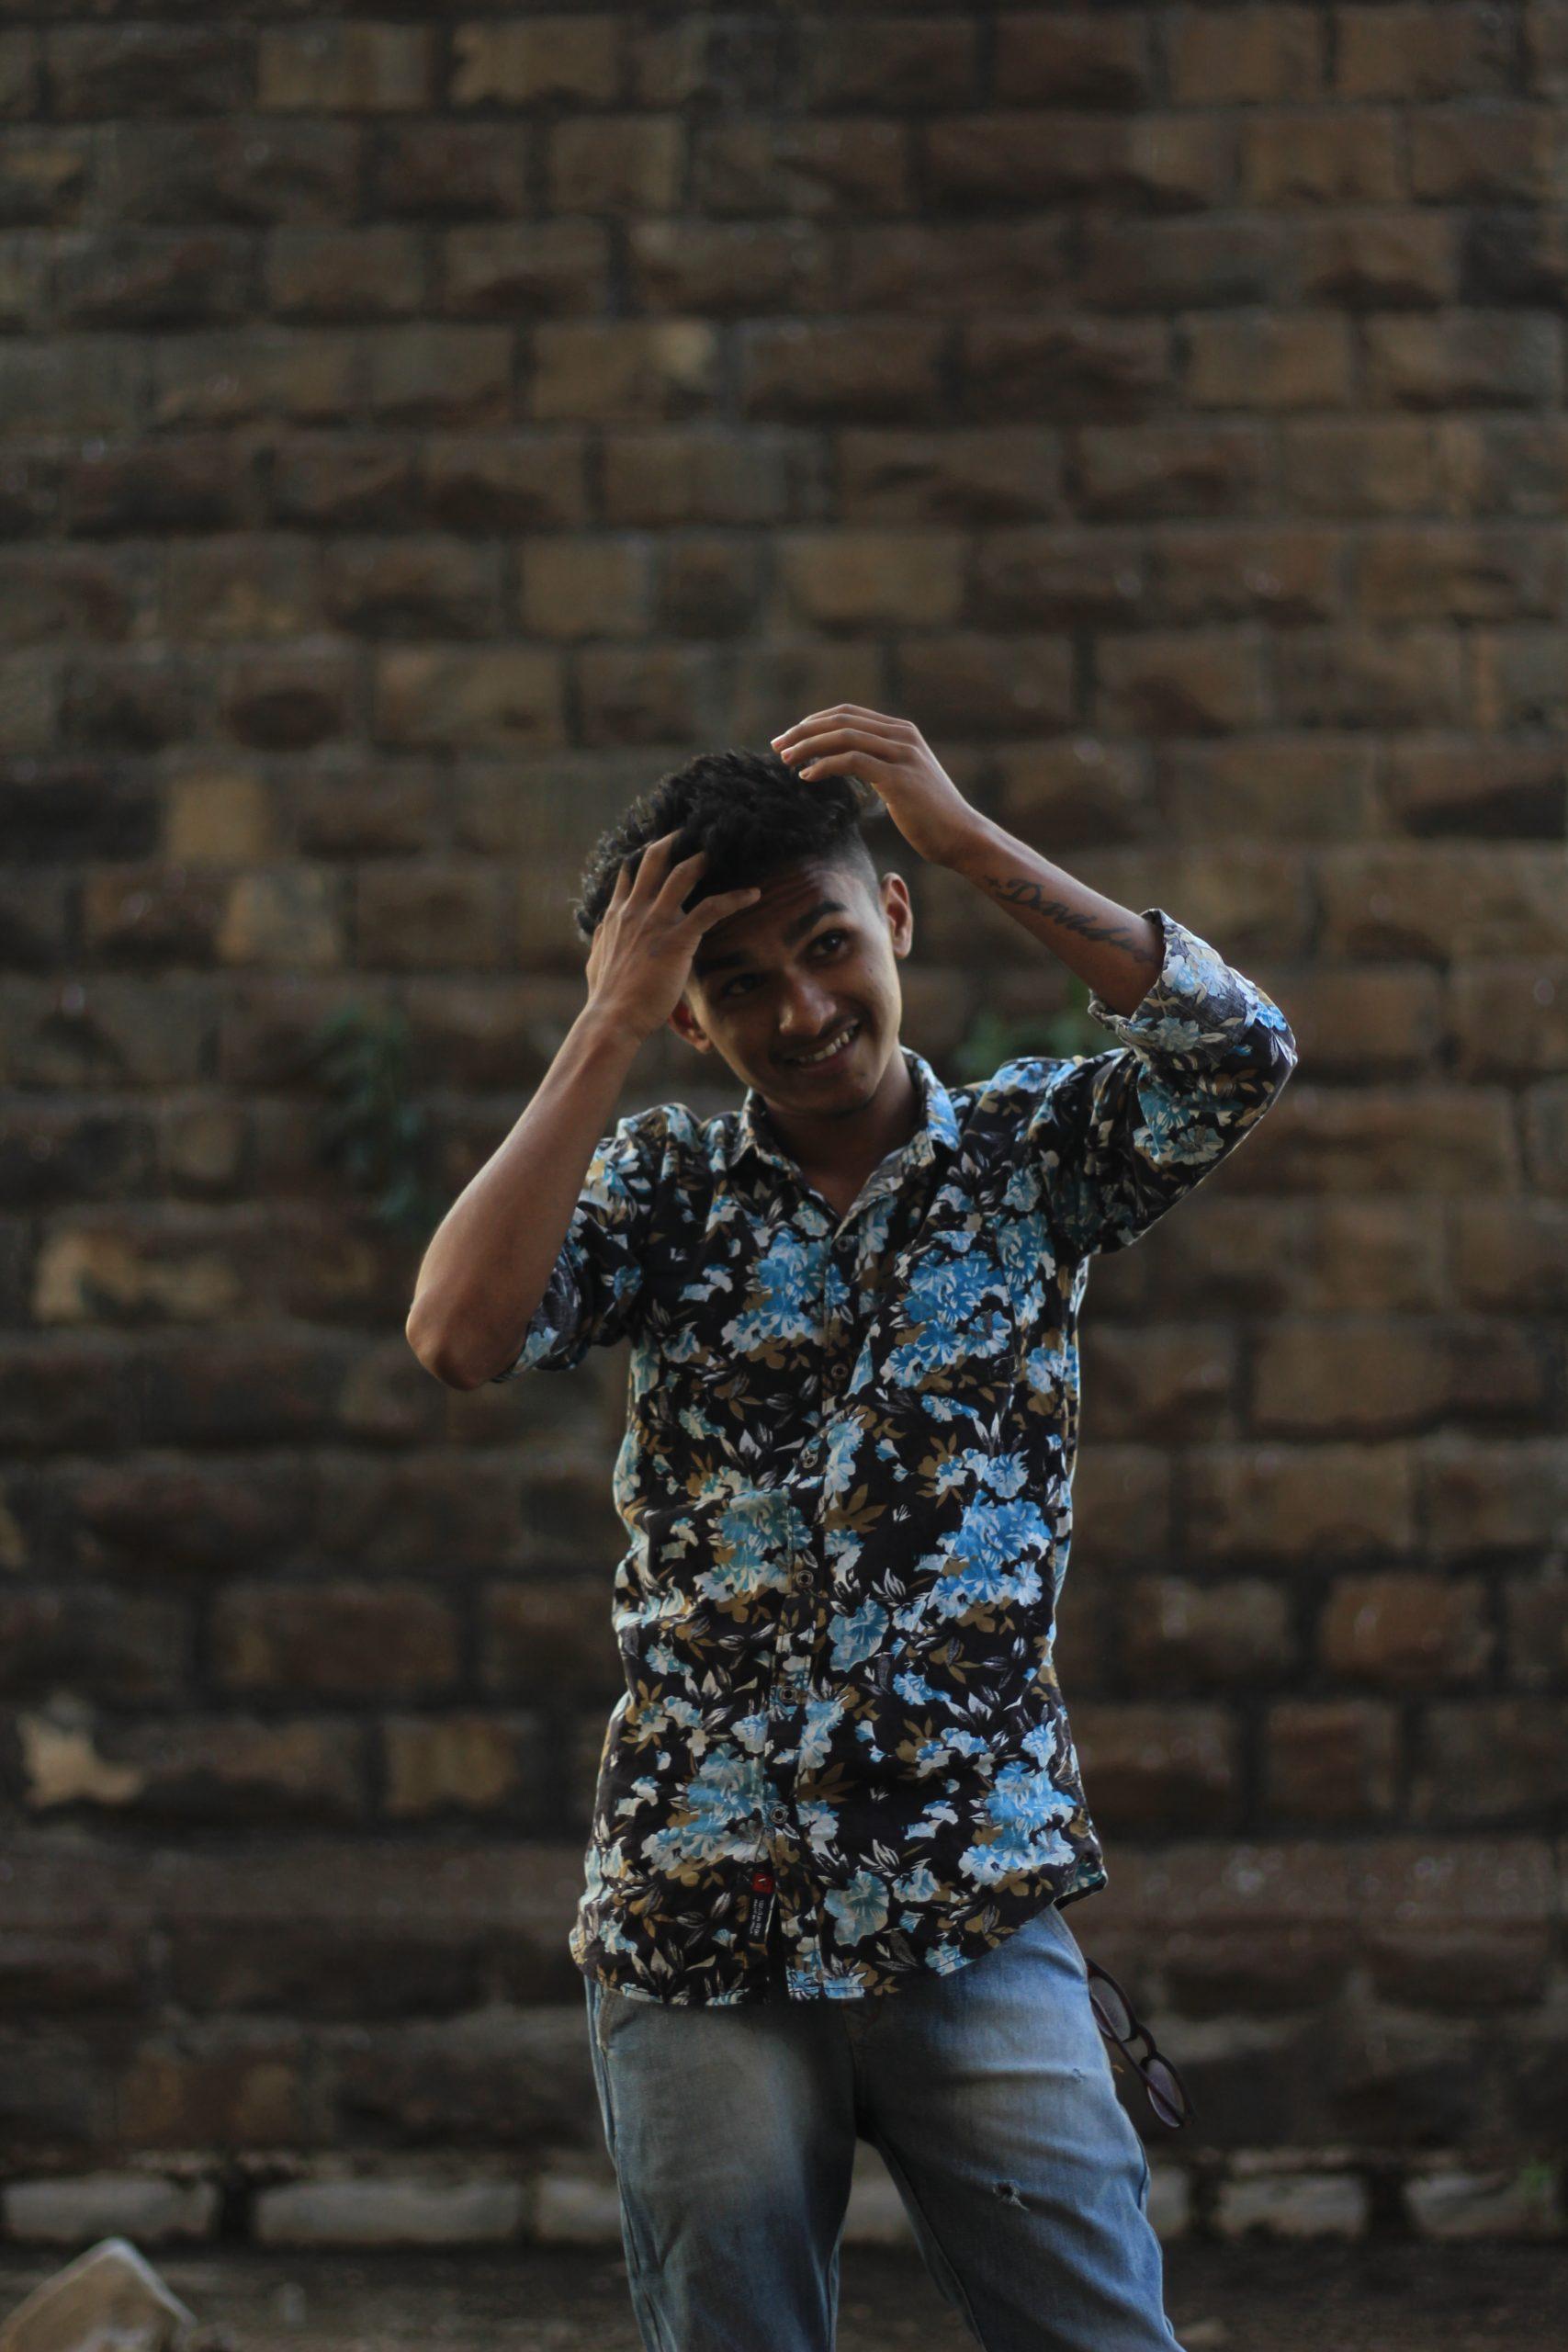 Boy posing hand on head